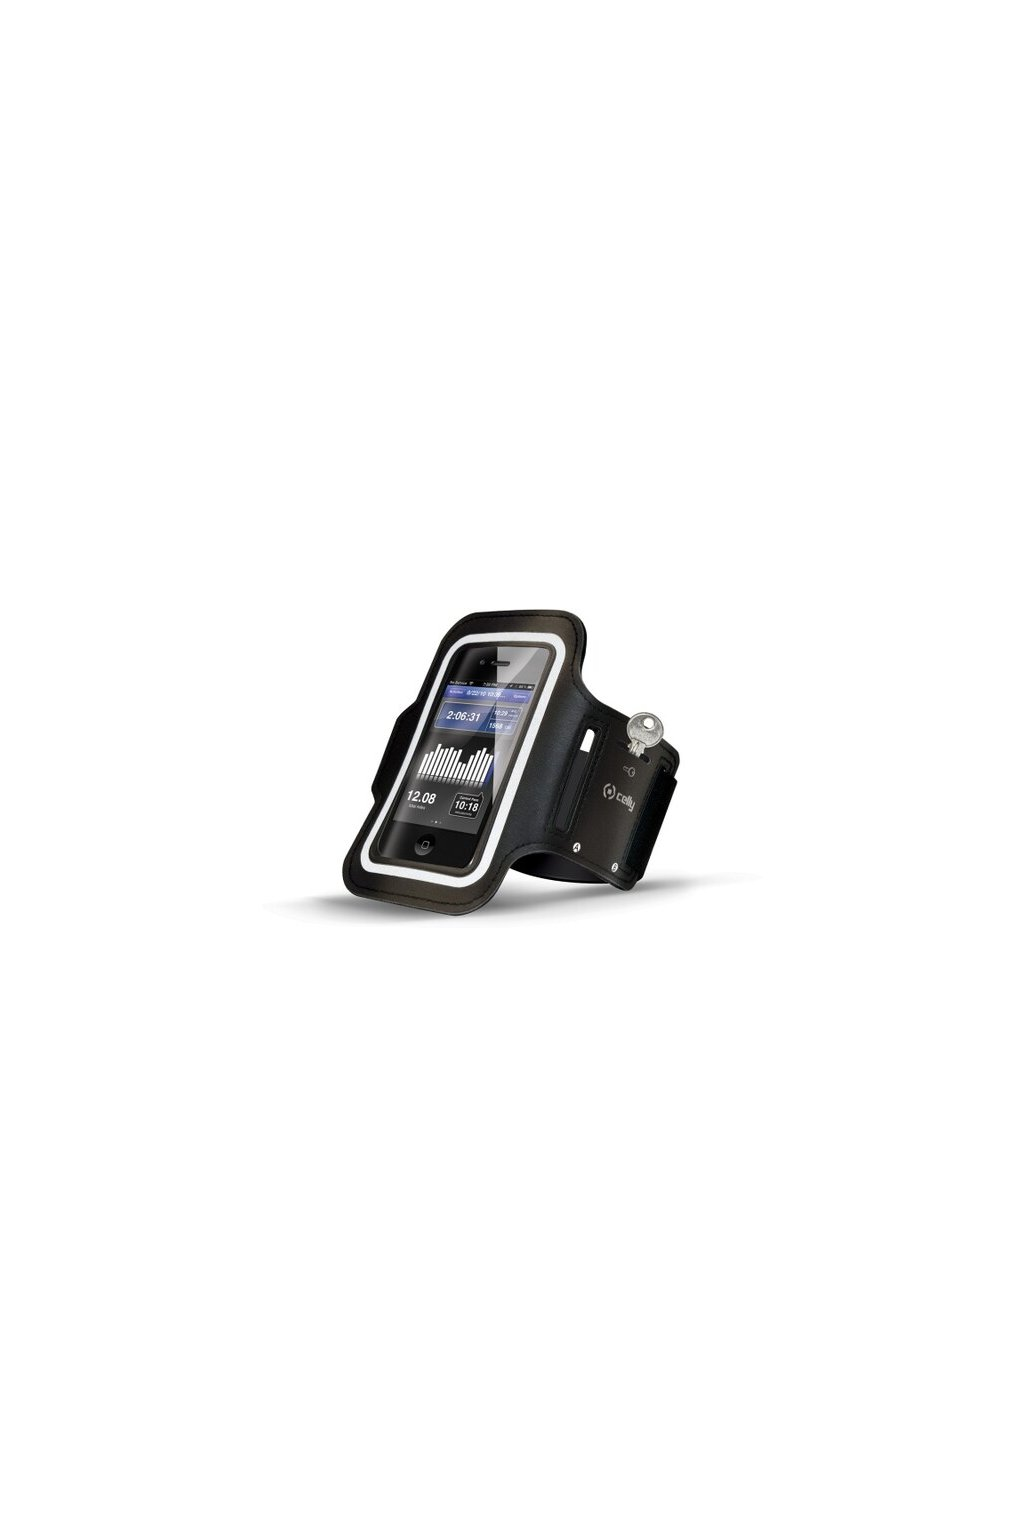 1706 celly sportovni univerzalni pouzdro iphone 5s se 6 6s 7 7 black